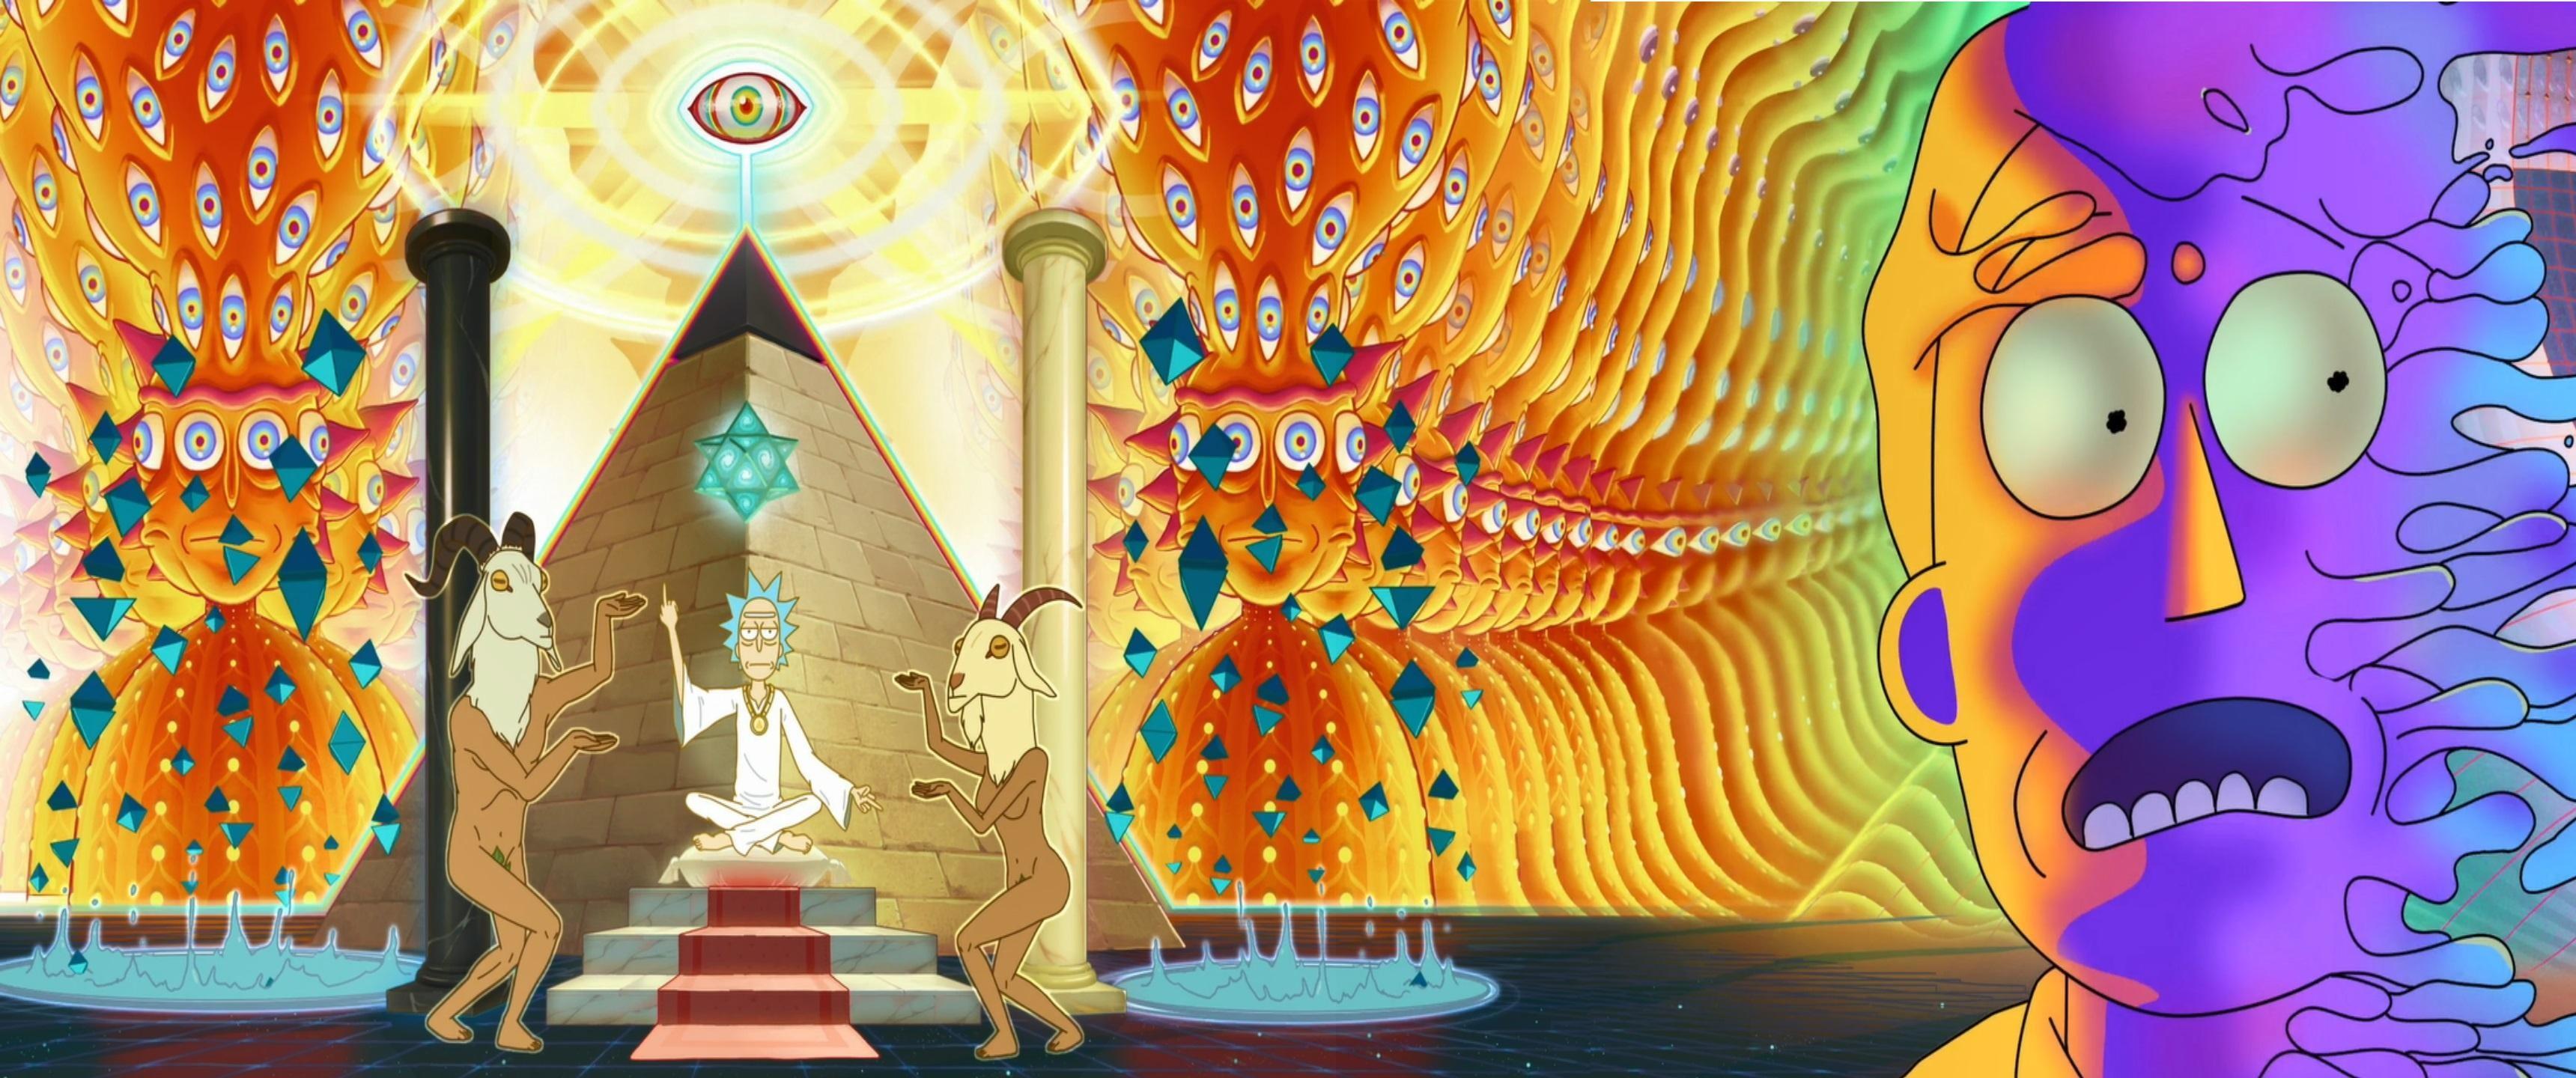 Acid Trip Wallpaper (68+ images)